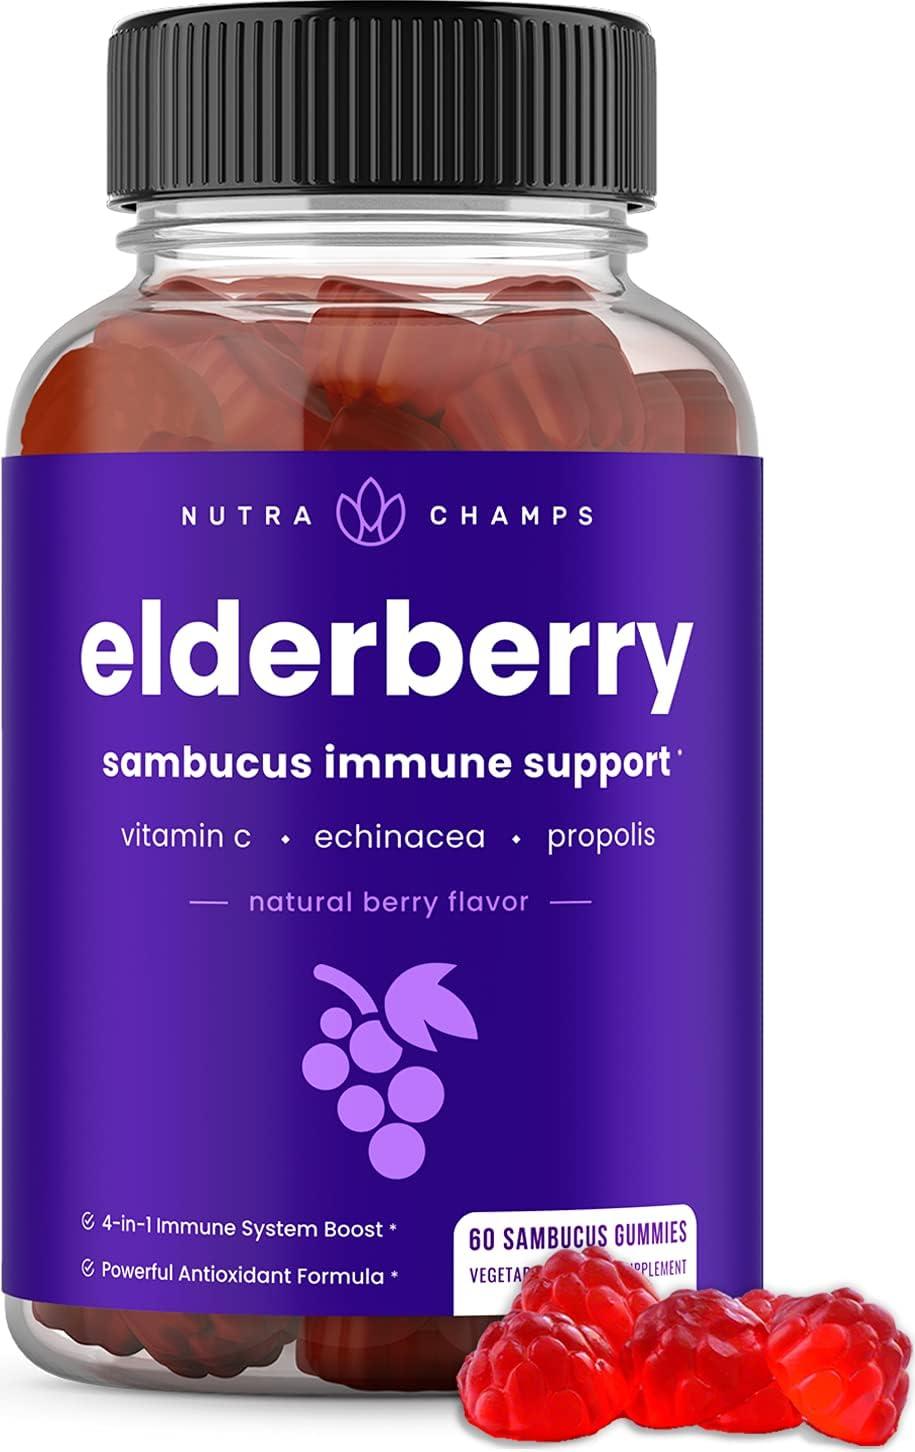 Elderberry Gummies with Vitamin Max 61% OFF C Echinacea Propolis 1 year warranty Immune -